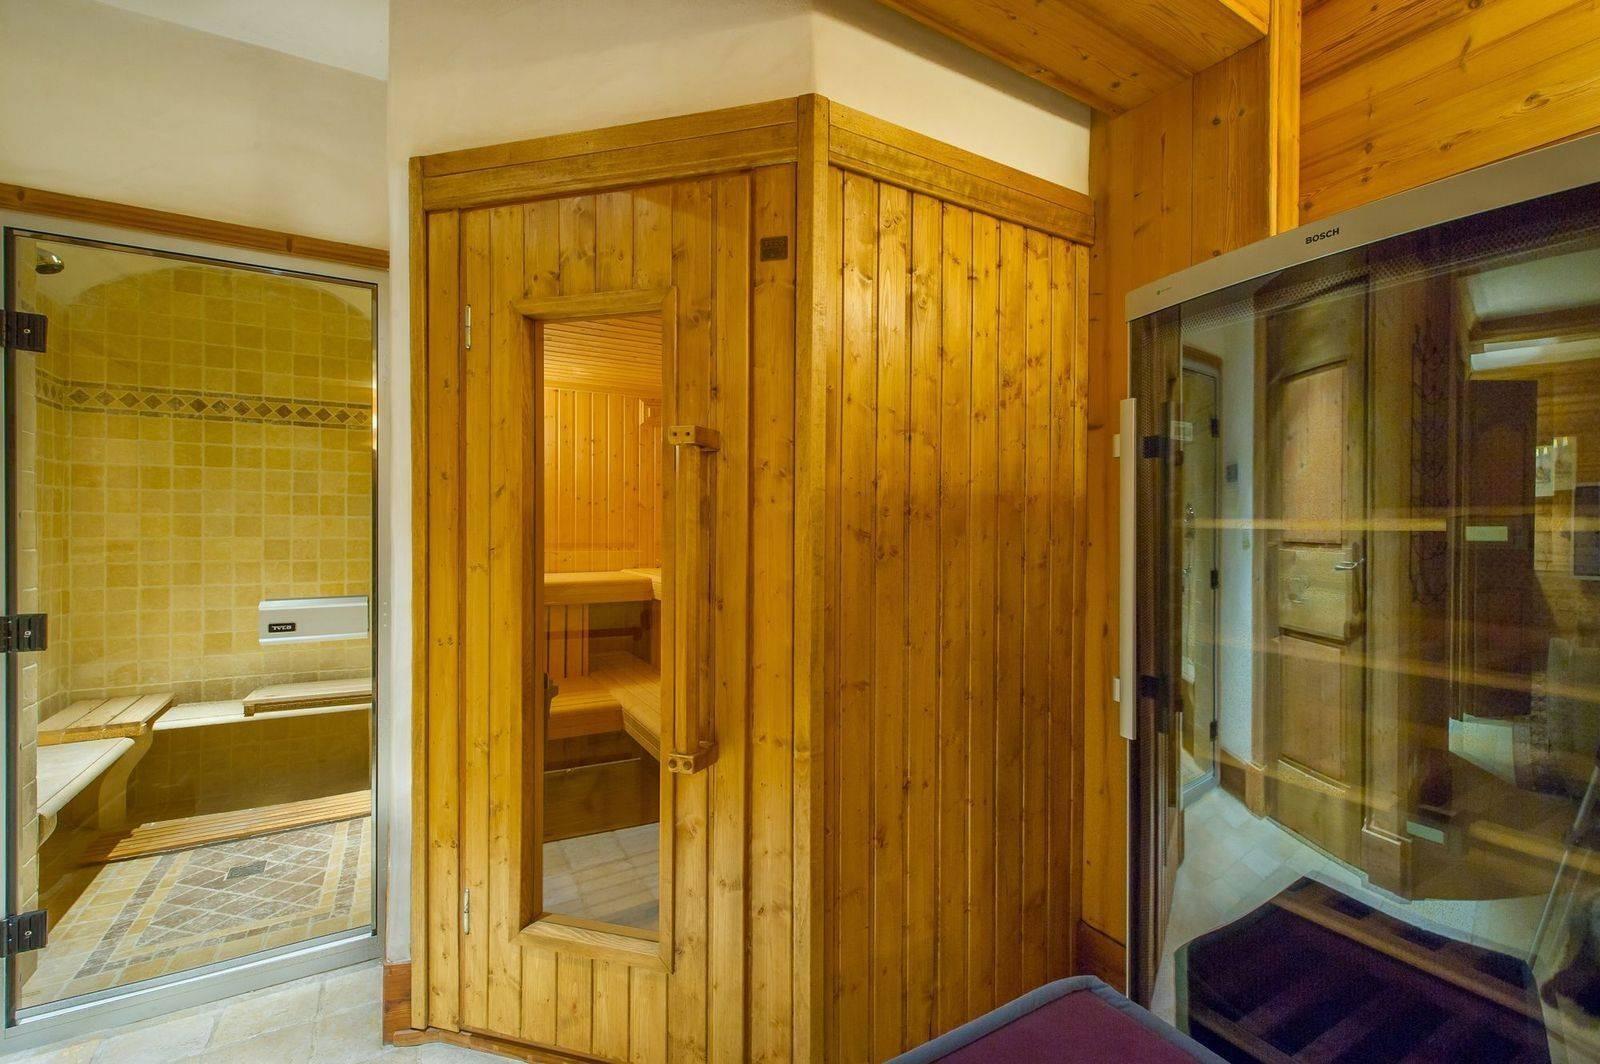 Courchevel 1850 Location Chalet Luxe Tancoite Sauna